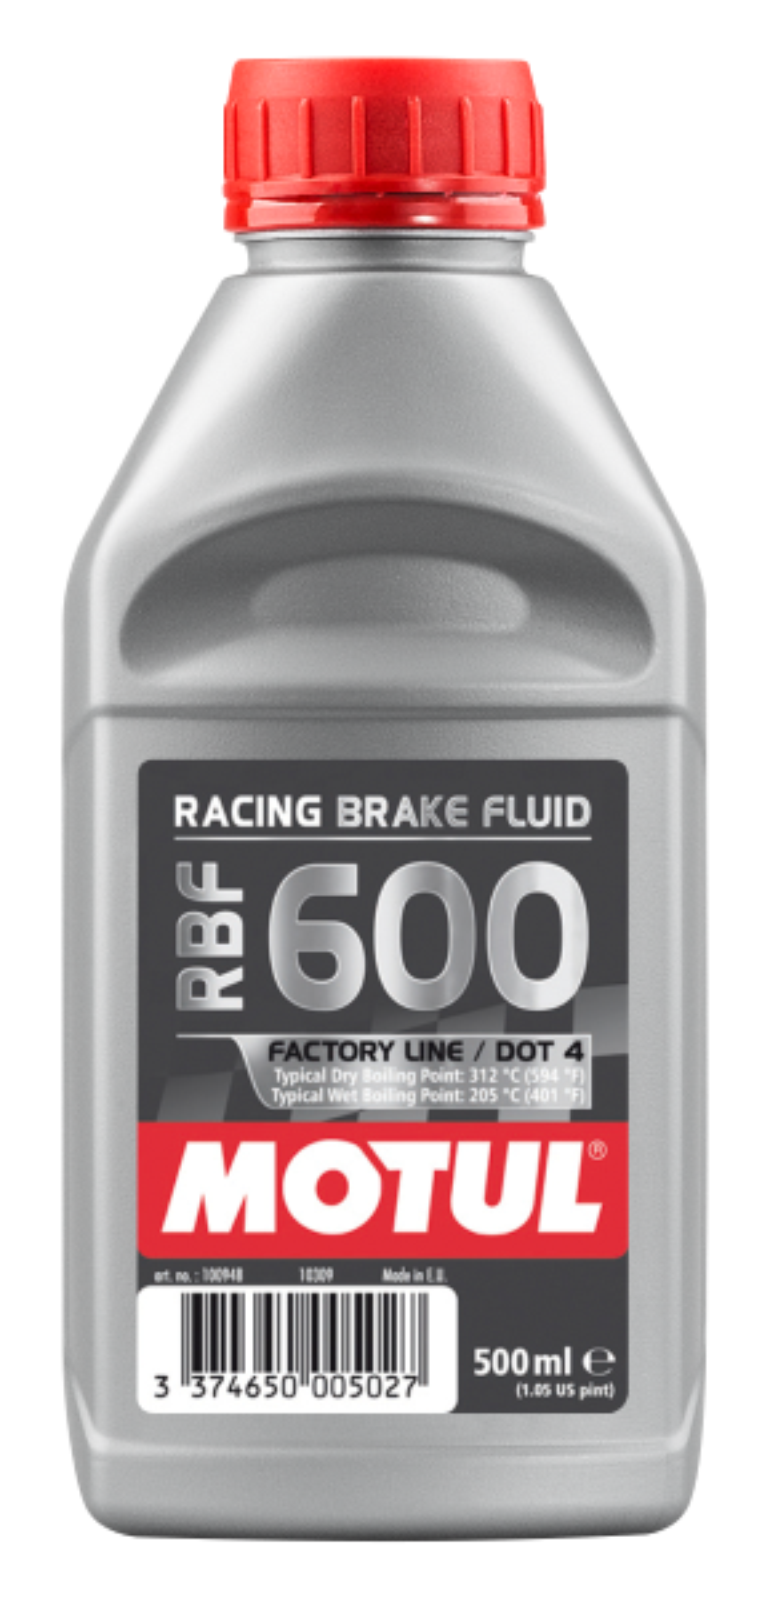 MOTUL AG MOTUL RBF 600 Factory Line 0,5L